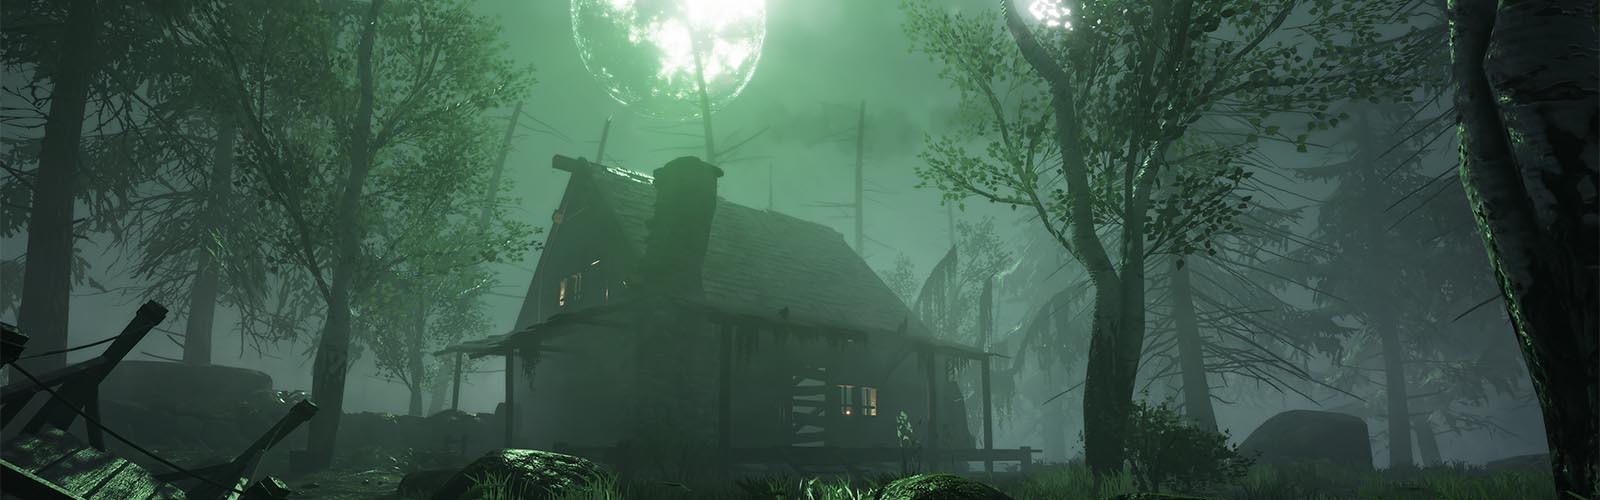 Warhammer: End Times - Death on the Reik (DLC) Steam Key GLOBAL